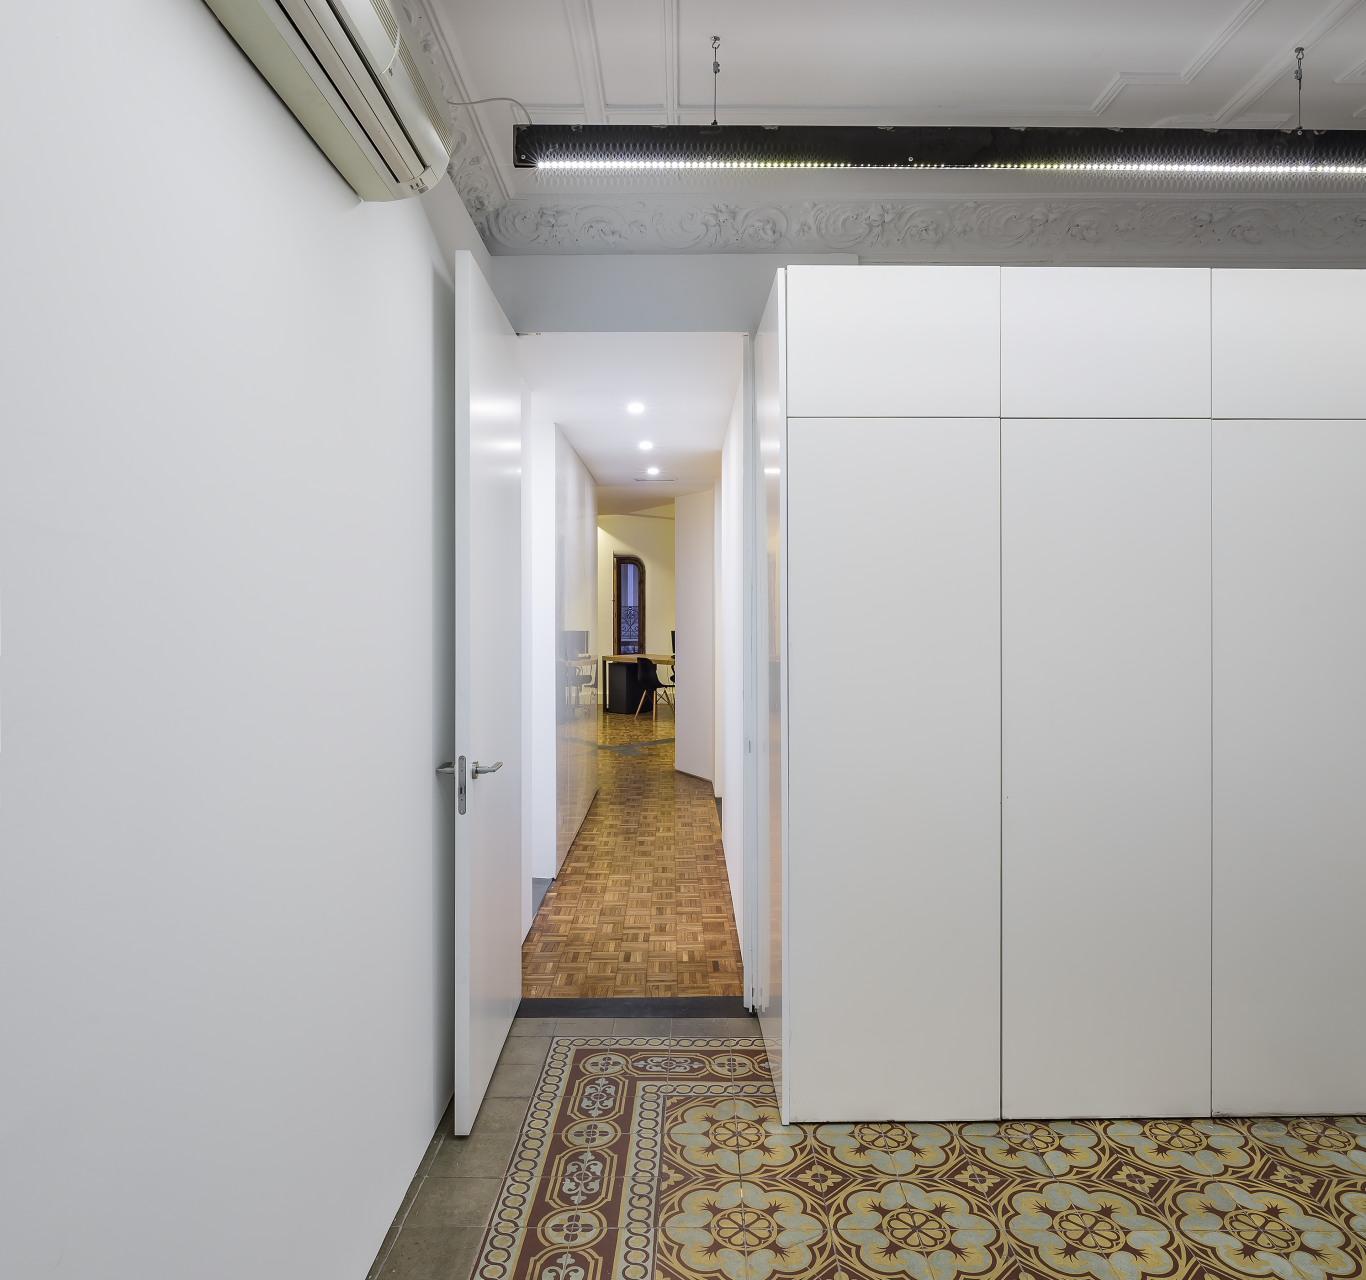 fotografia-arquitectura-interiorismo-valencia-german-cabo-viraje-estudio-pujol (17)